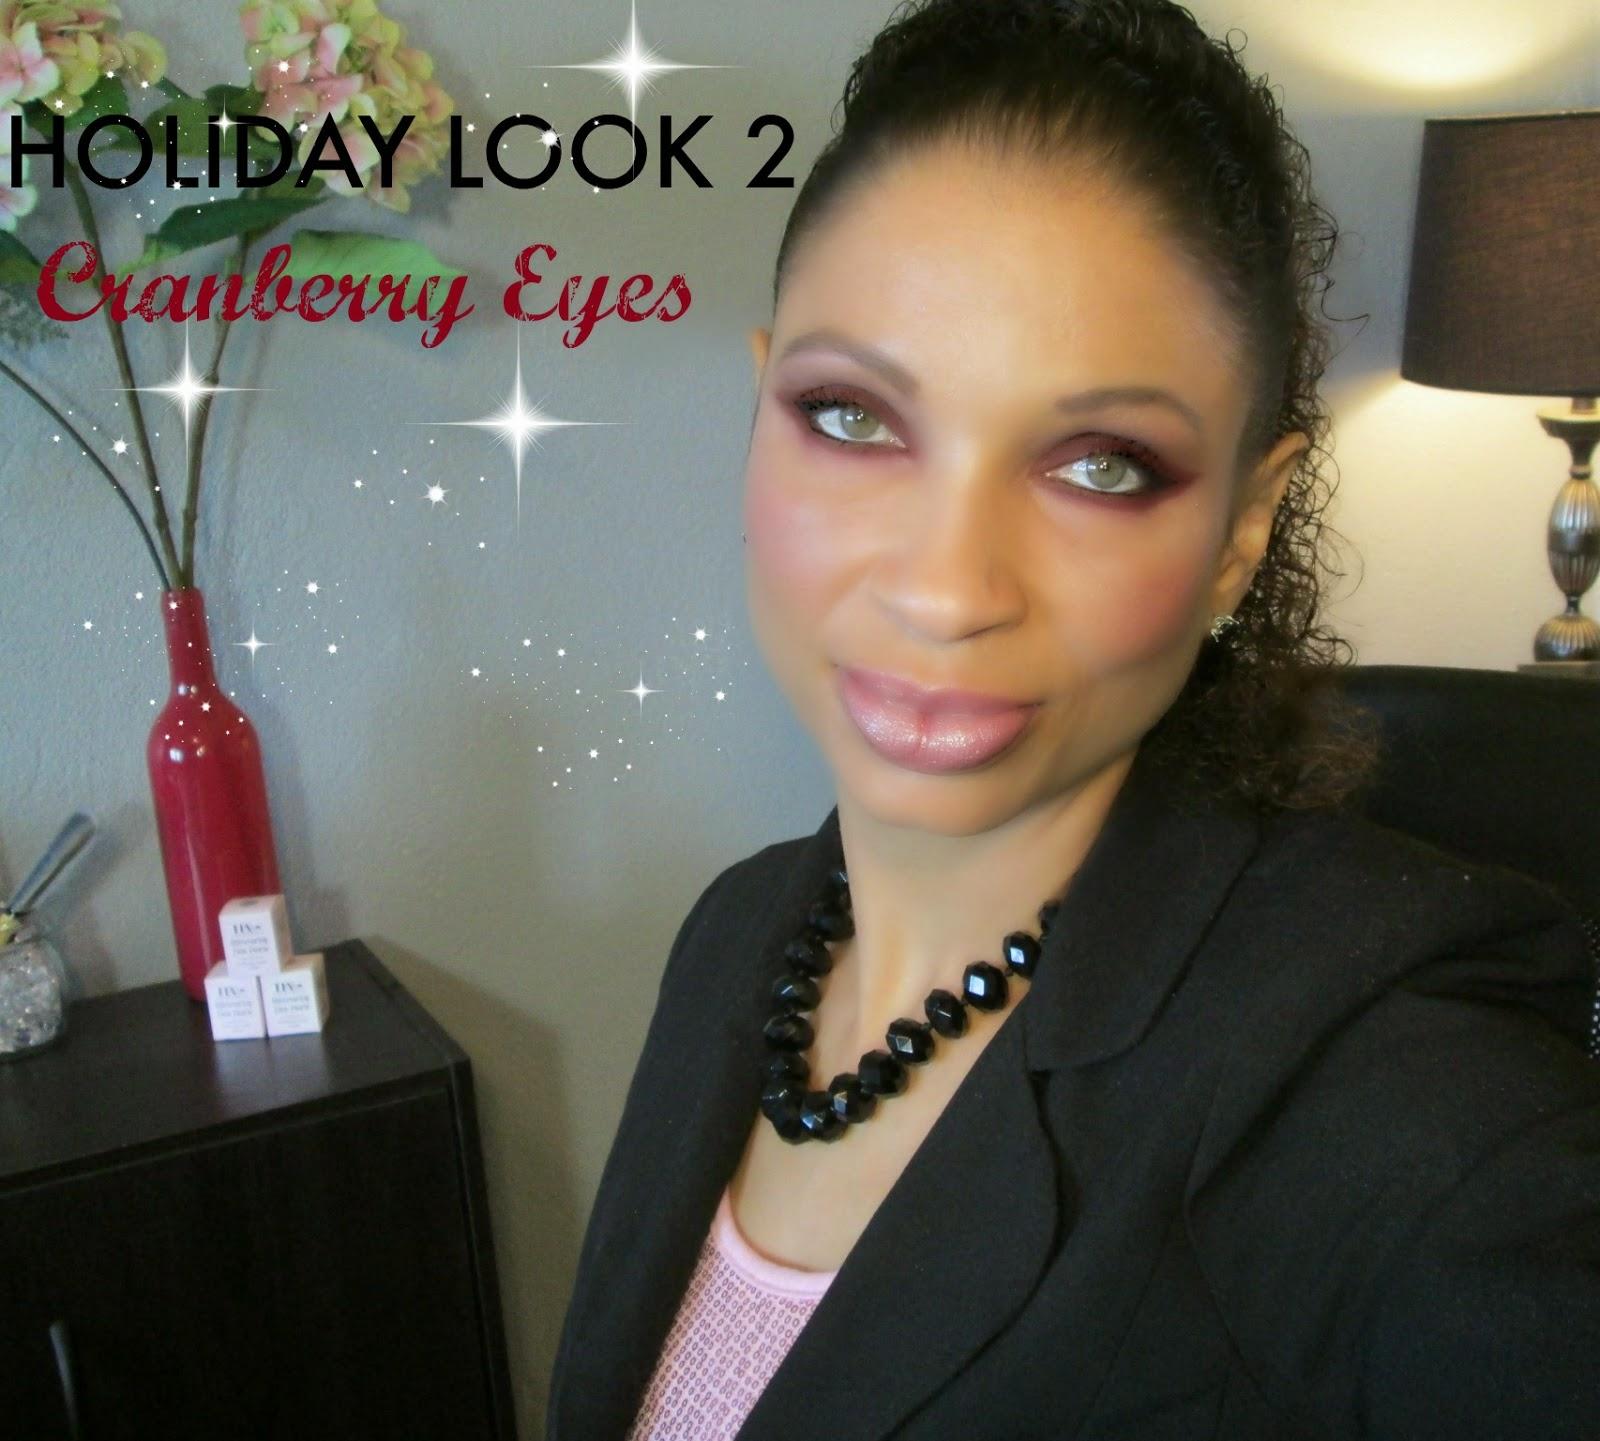 http://chrysalisglam101.blogspot.com/2014/12/holiday-party-makeup-series-look-2.html